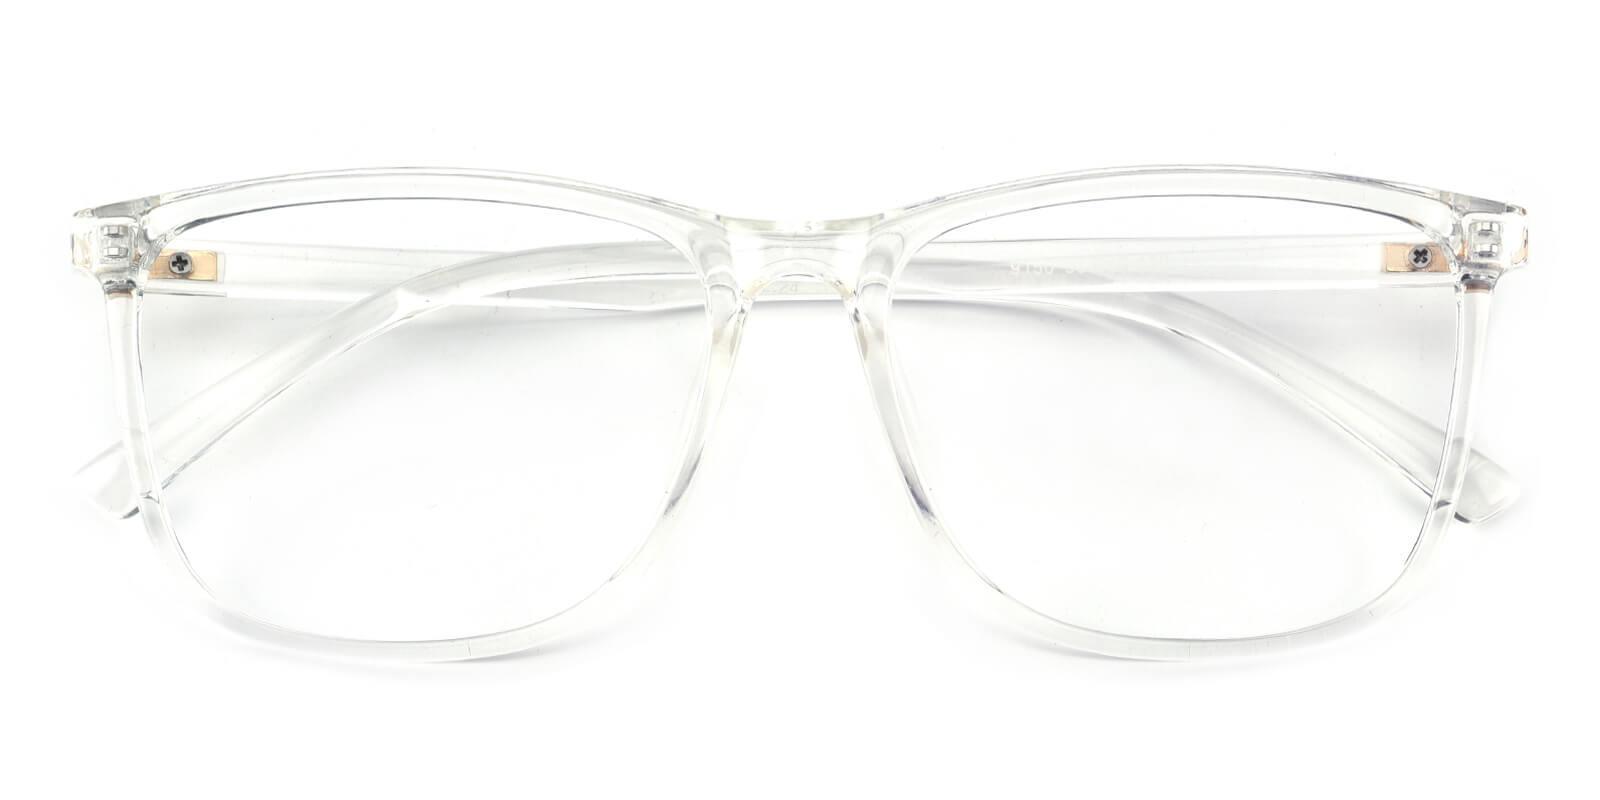 Poise-Translucent-Square-TR-Eyeglasses-detail